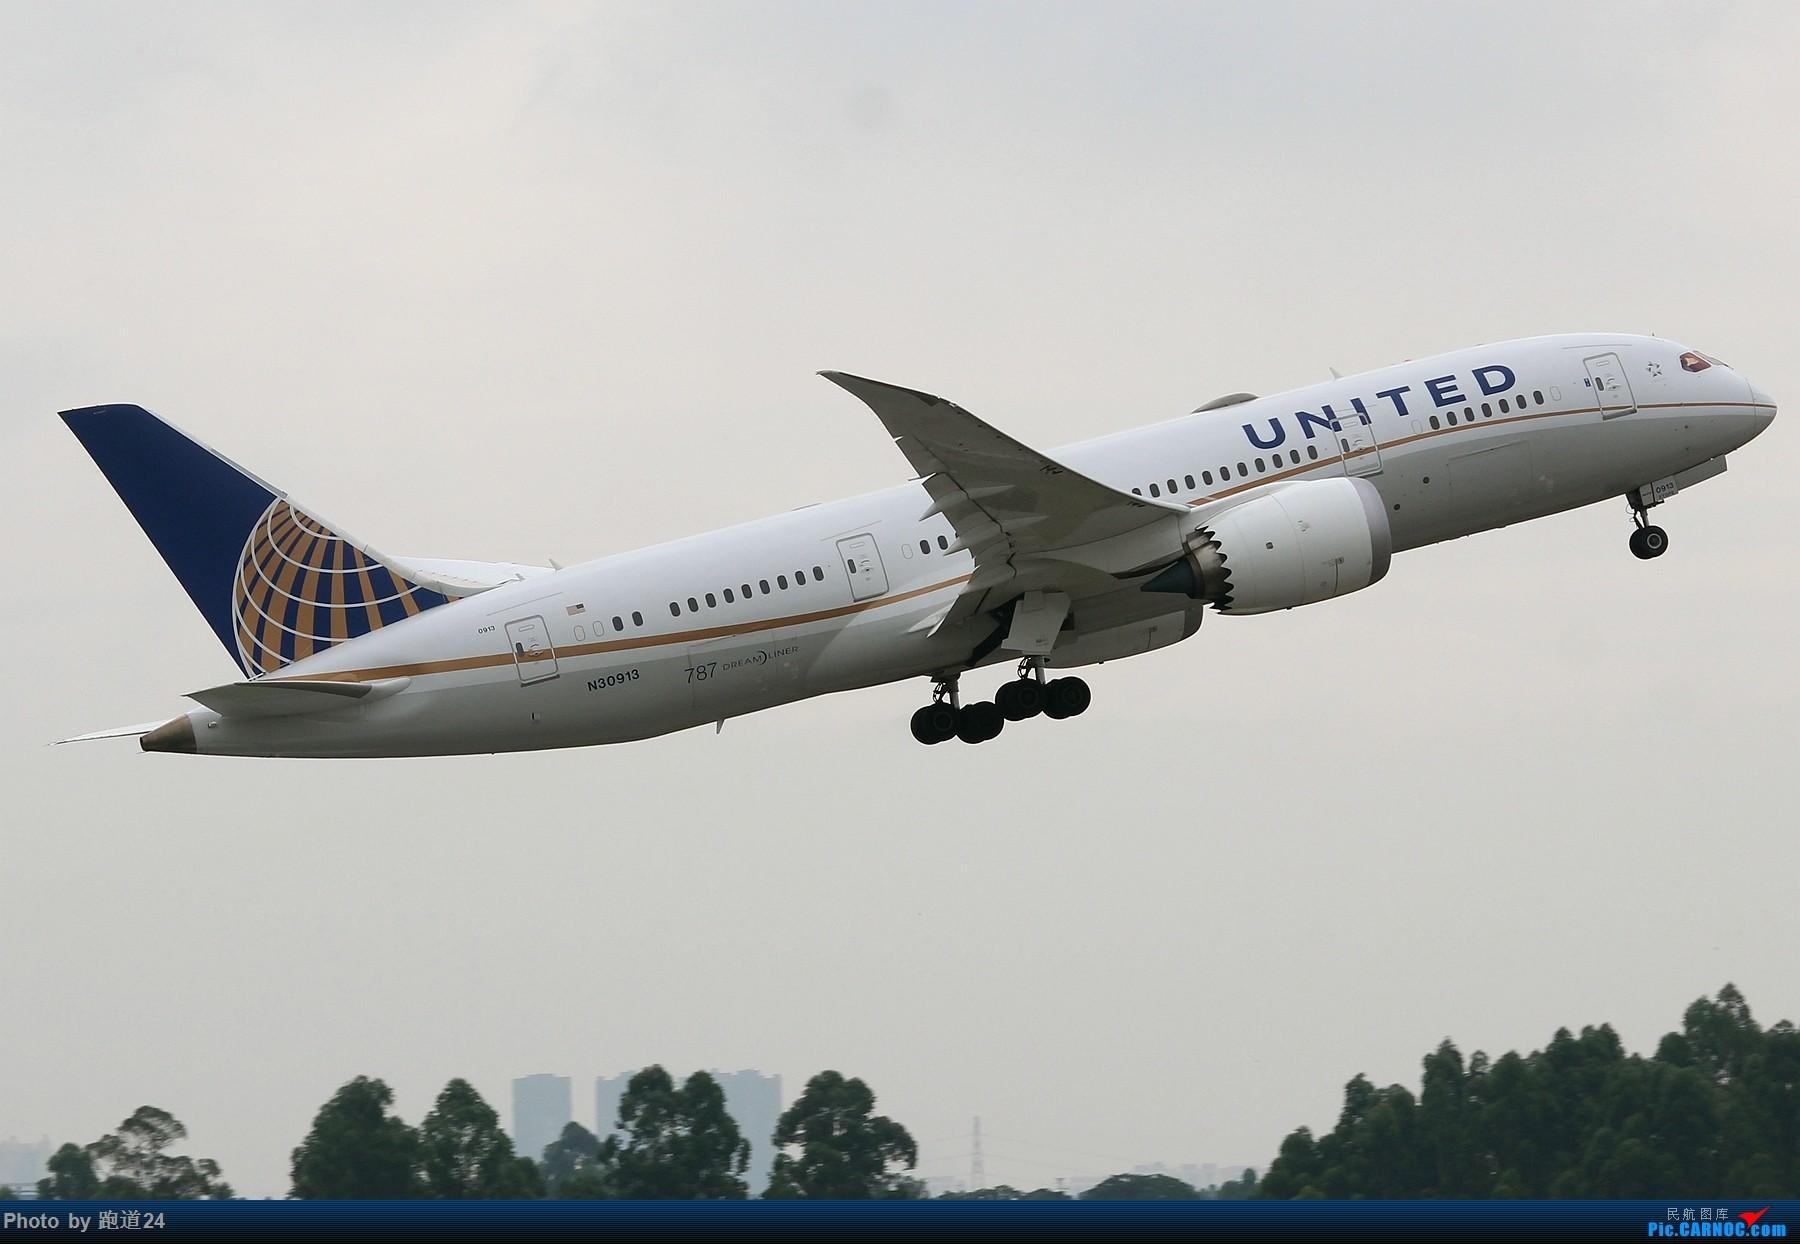 Re:[原创]【多图党】6月18日成都拍机【埃塞俄比亚航空B777-200LR】 BOEING 787-8 N30913 中国成都双流国际机场